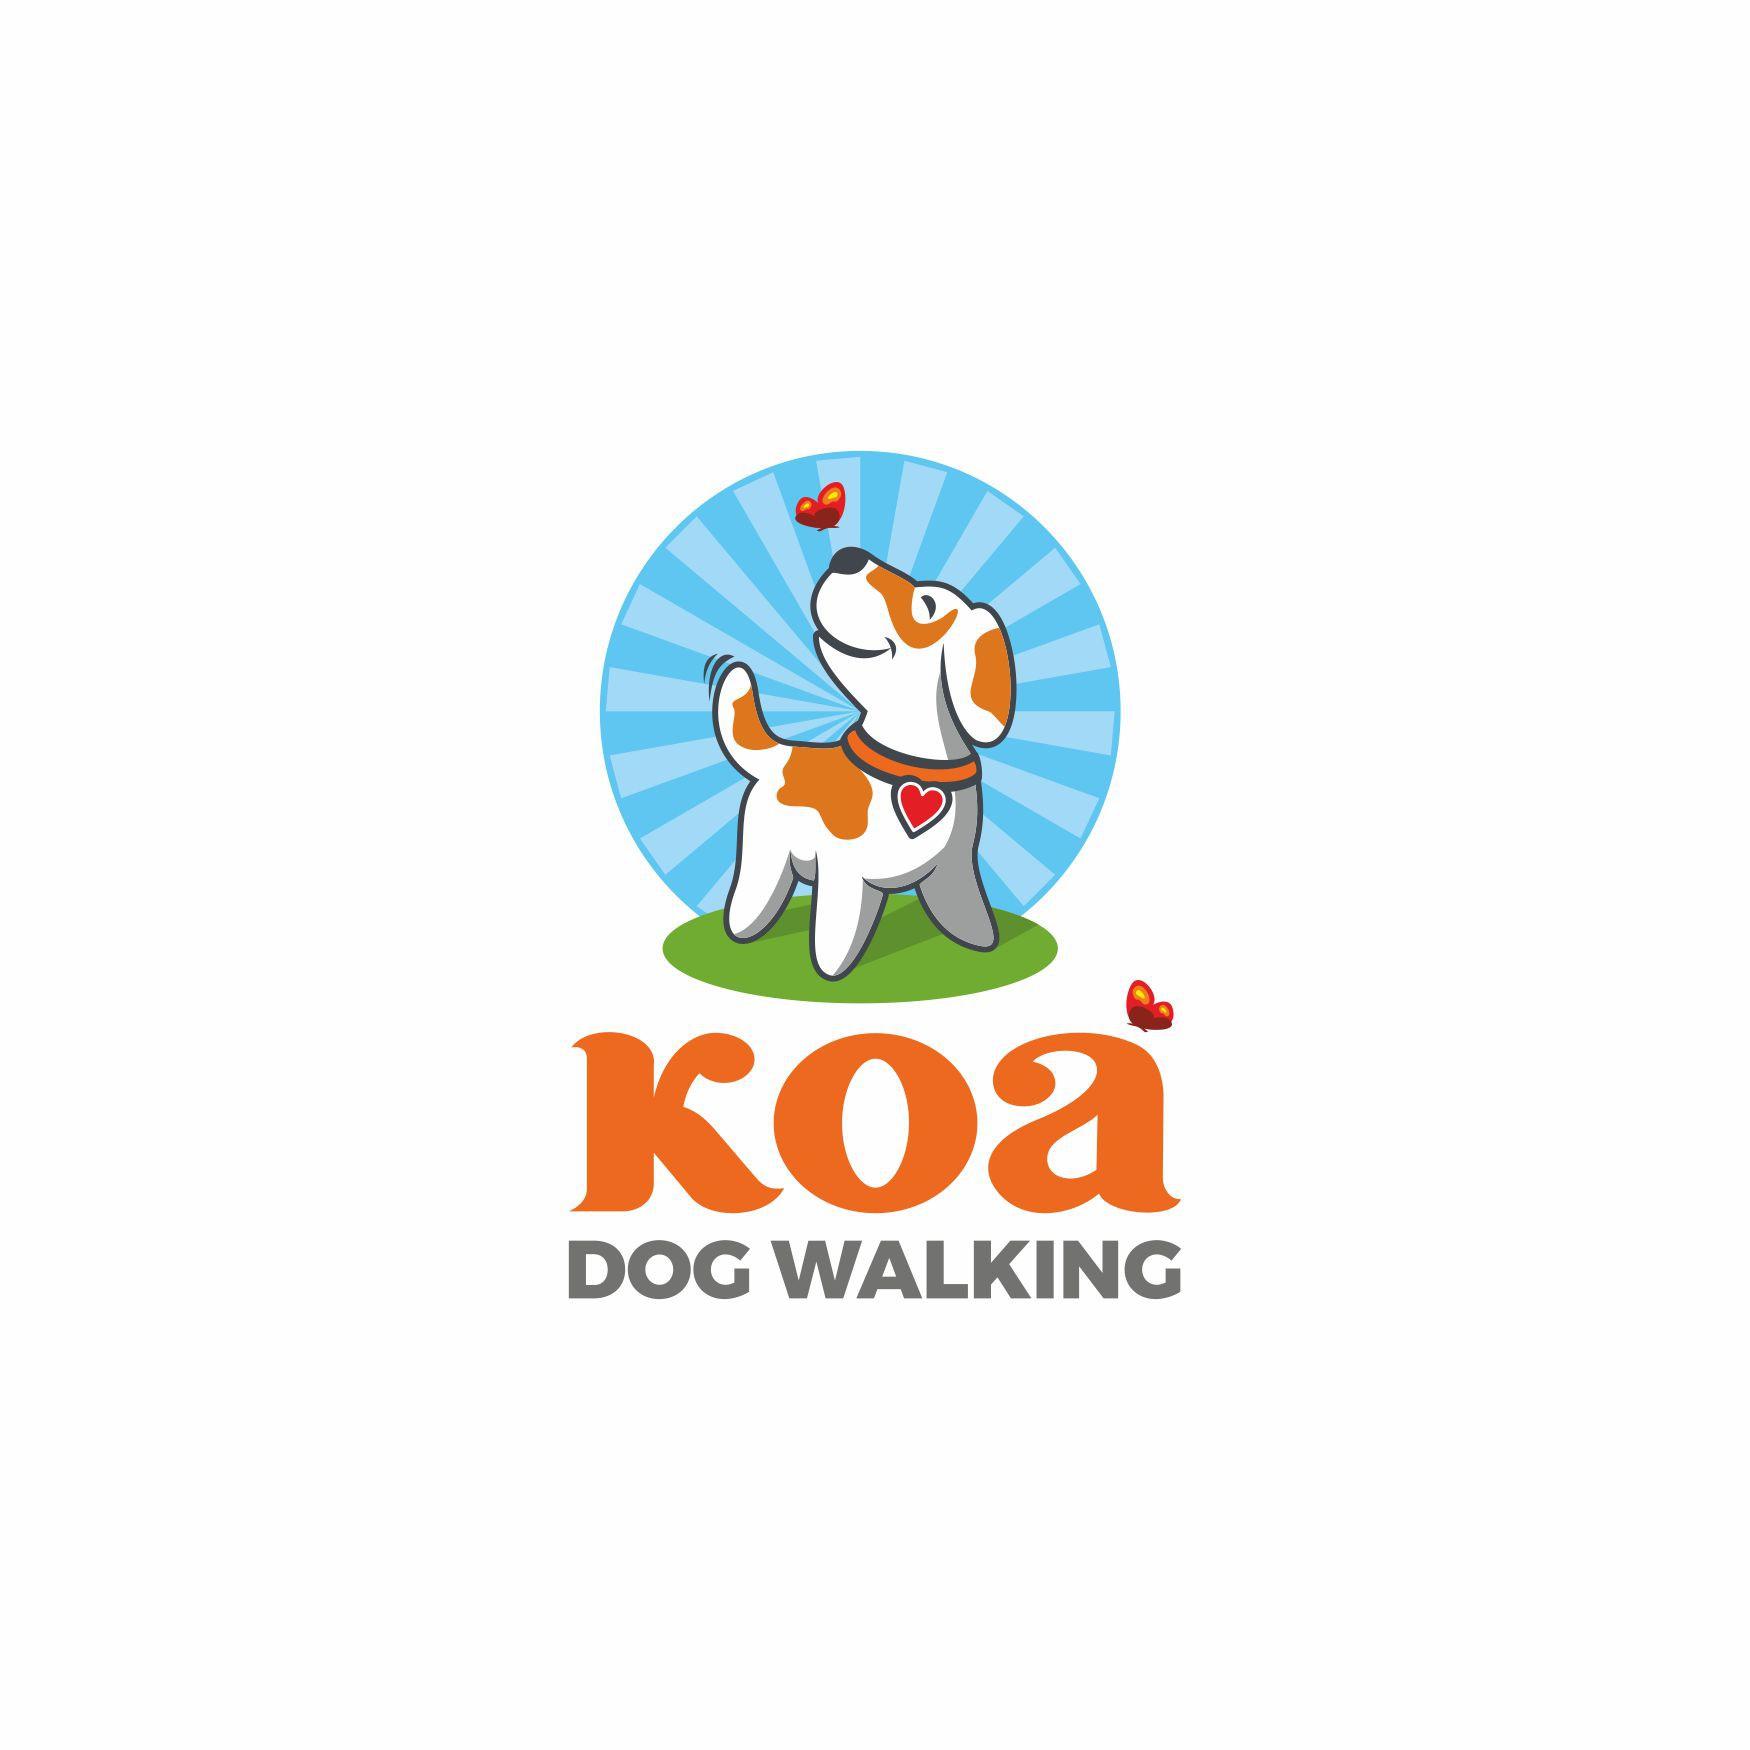 Dog Walking business needs friendly & sophisticated logo